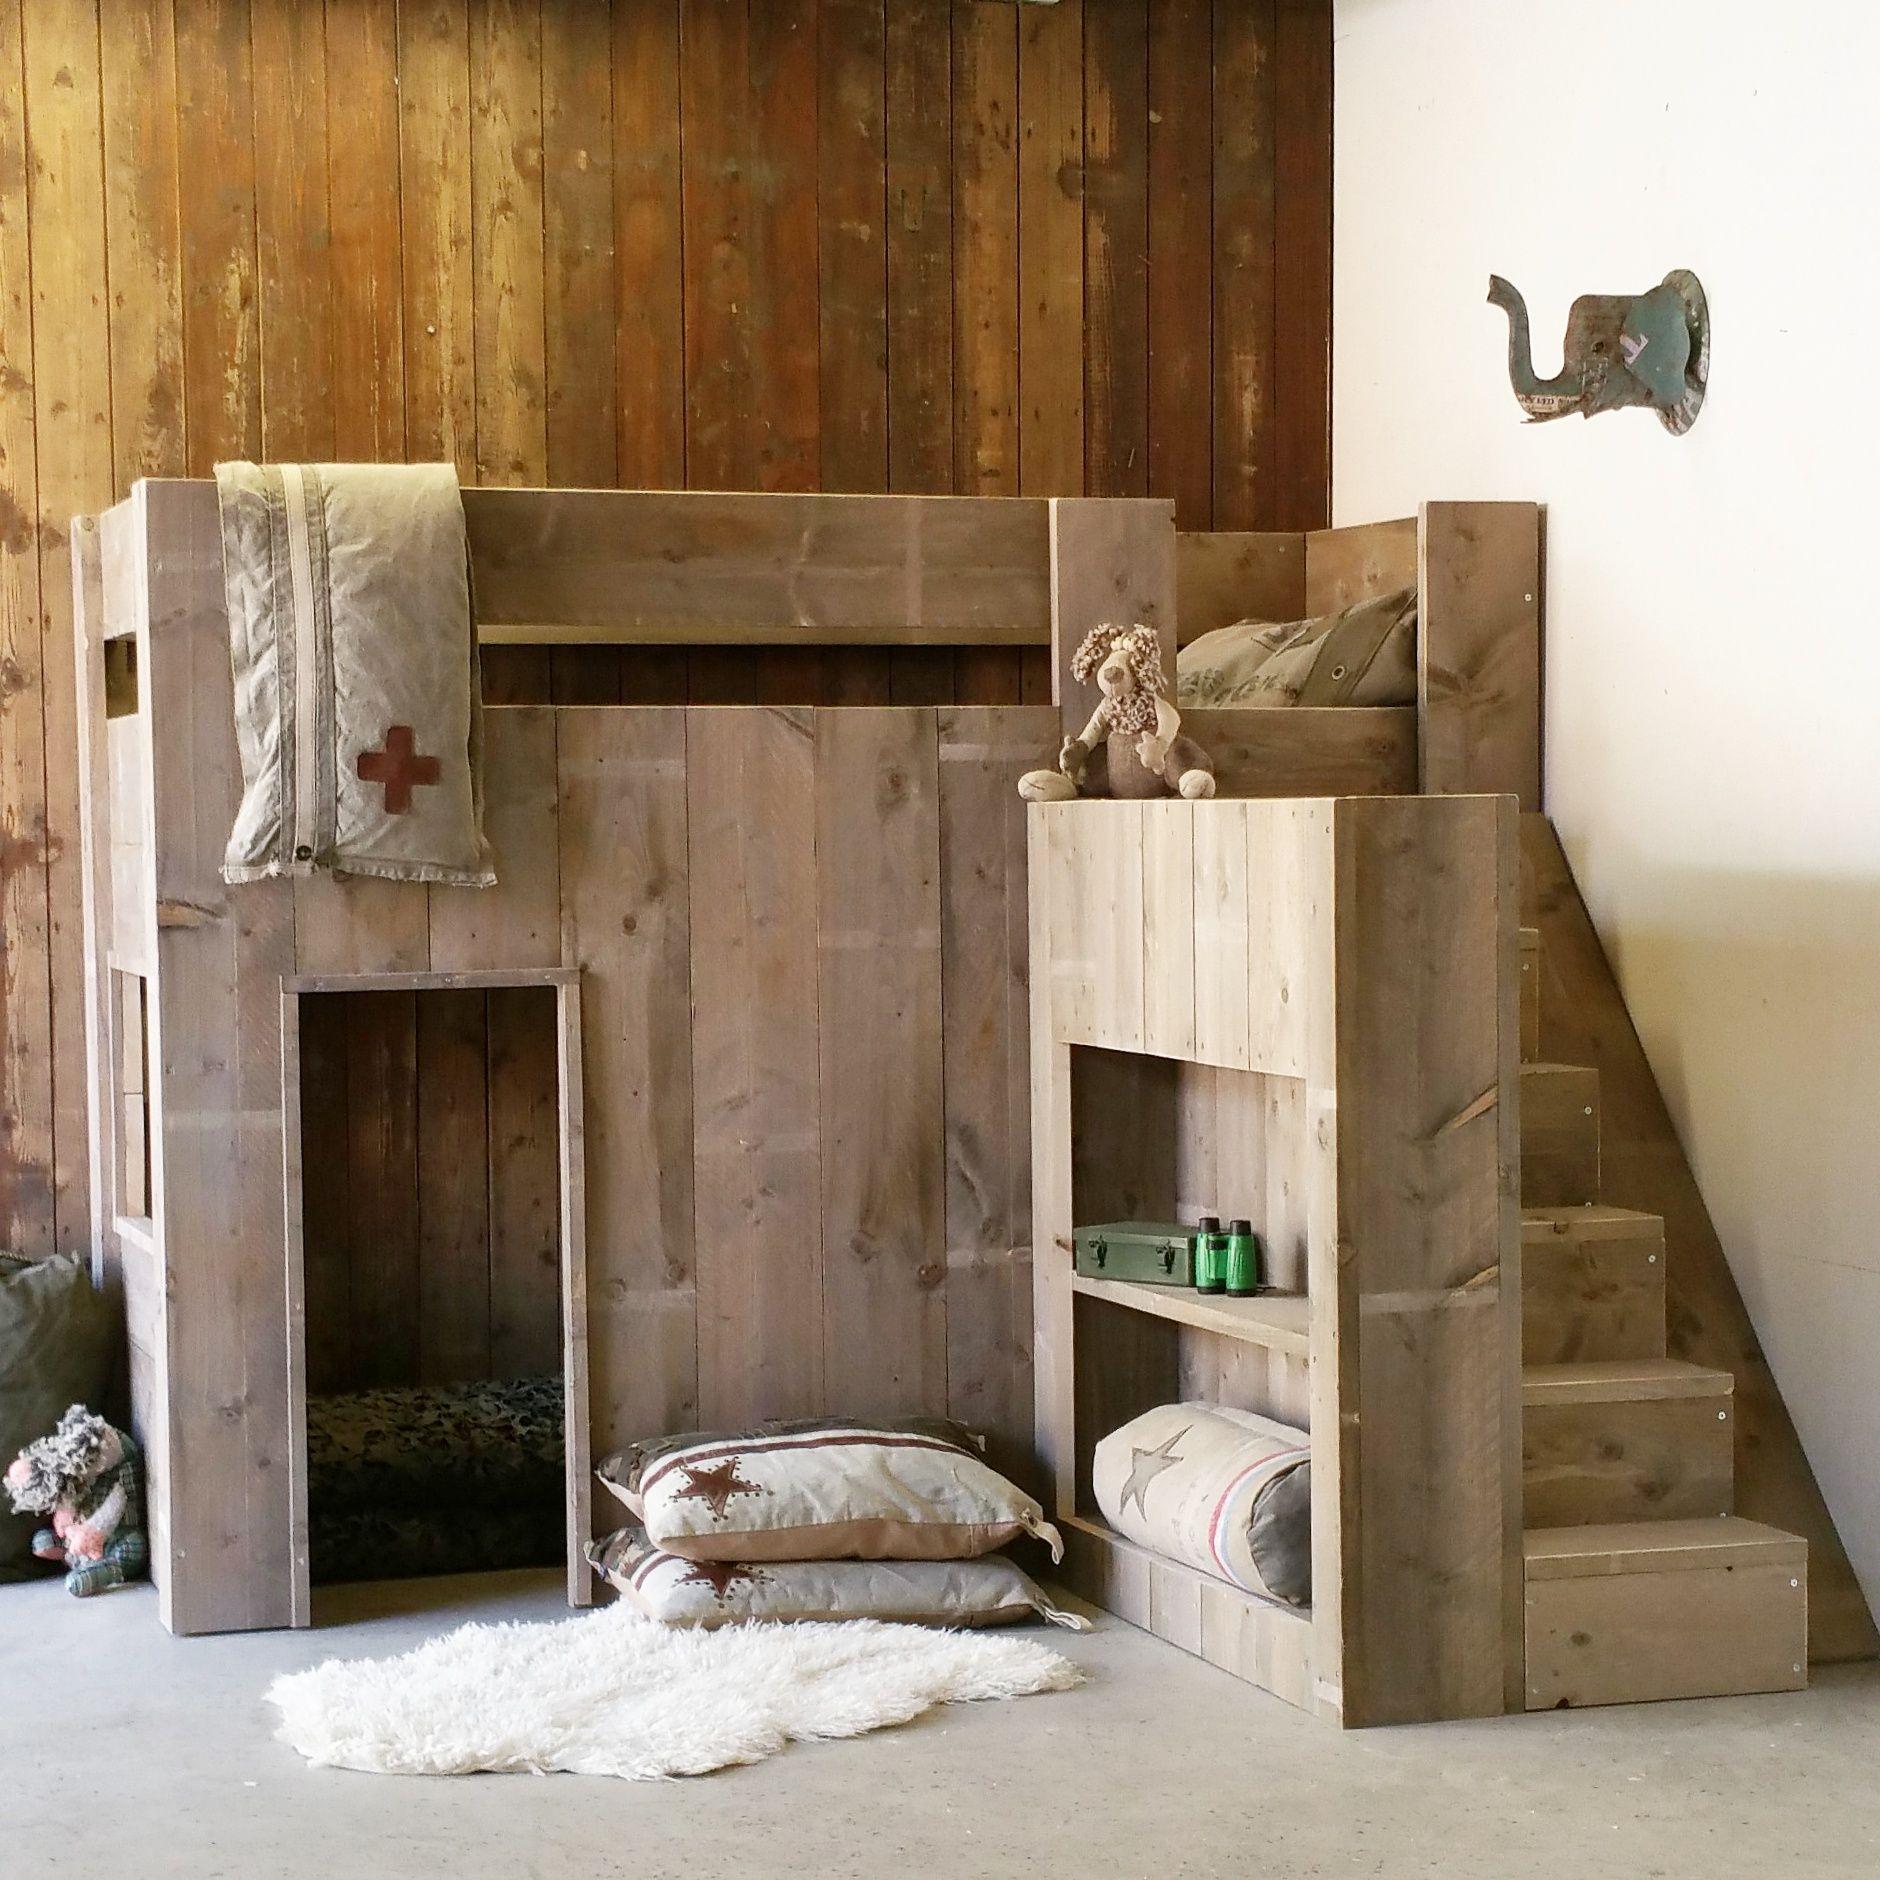 Camo loft bed with slide  Imre Nieuwenweg imre on Pinterest